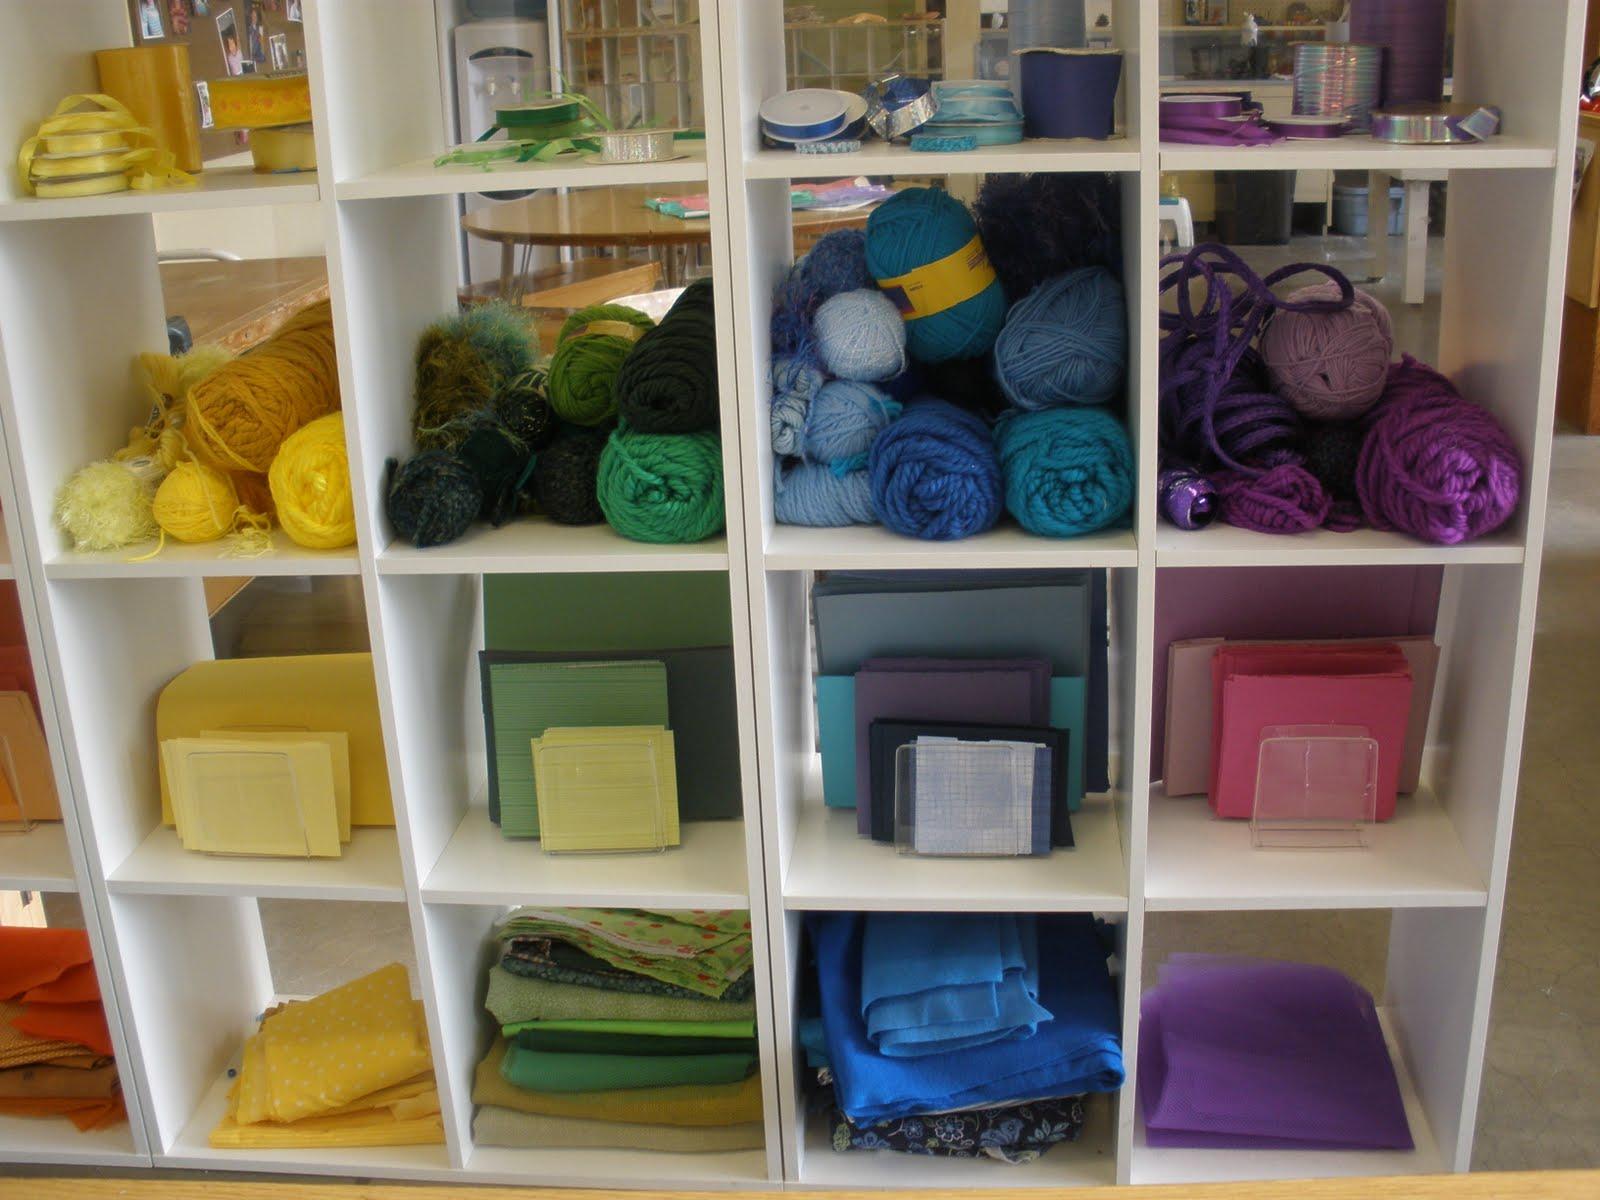 Reorganizing Room: Reorganizing A Room: Part 2